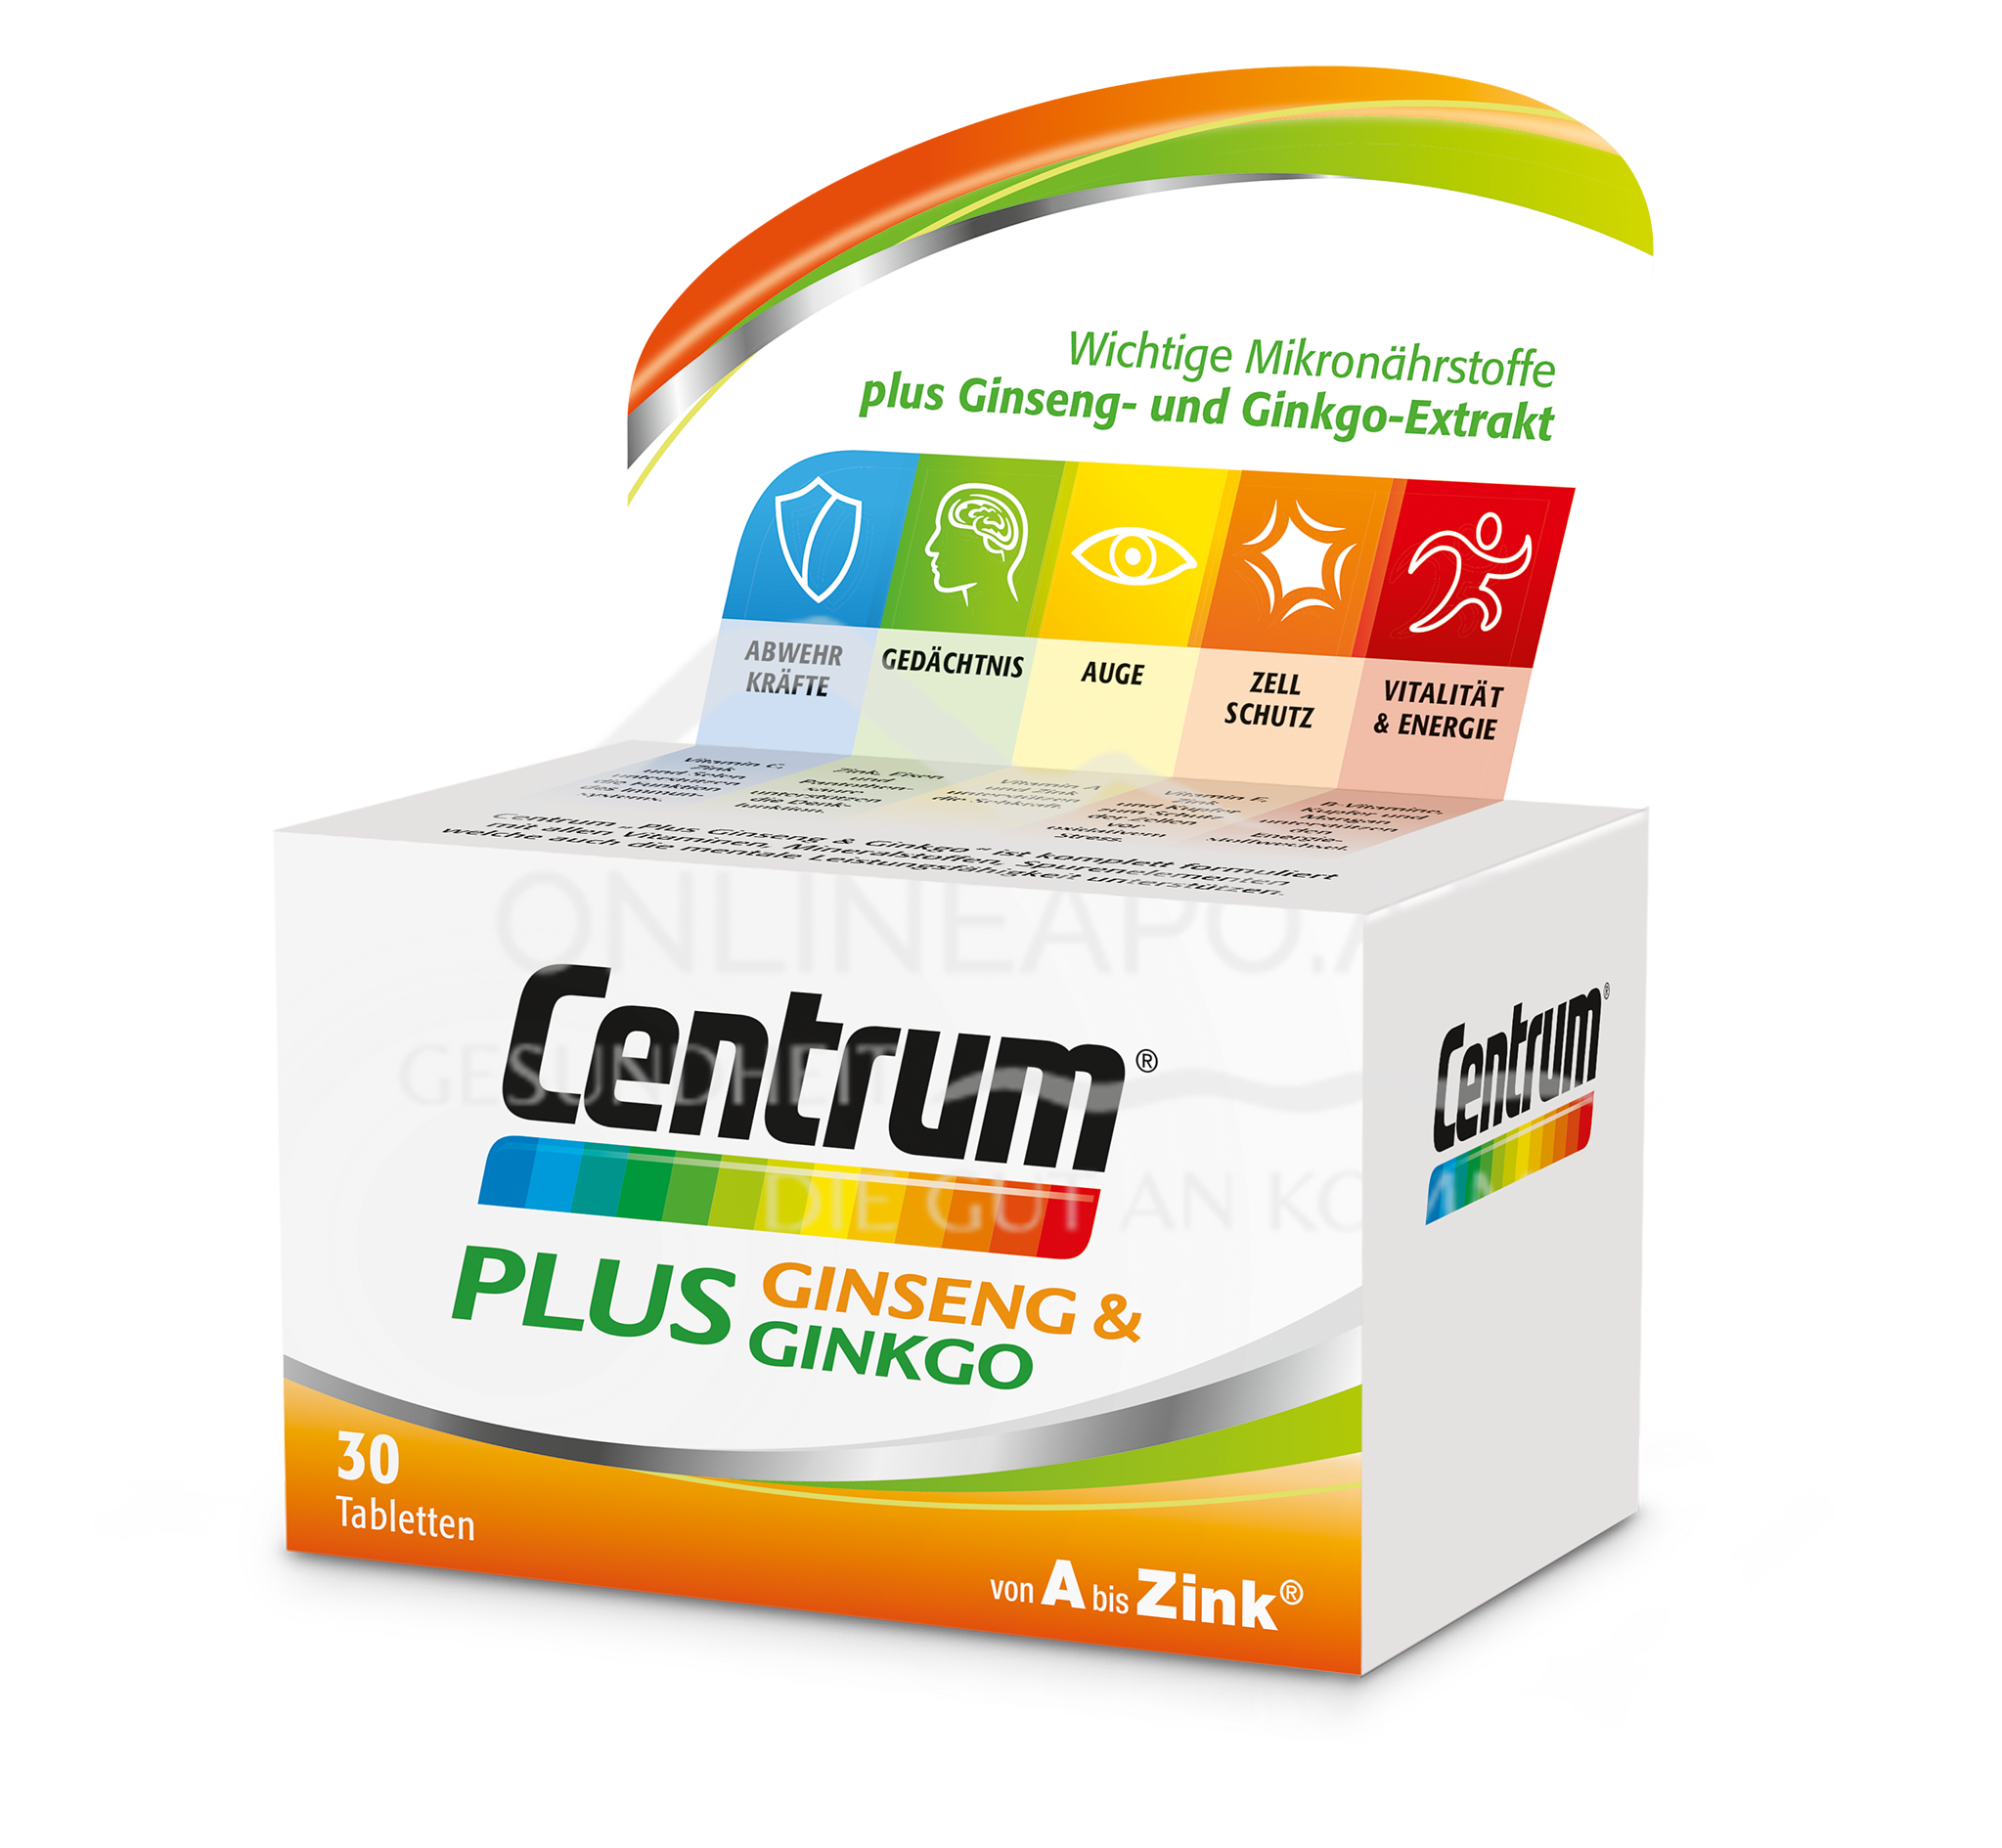 Centrum® Plus Ginseng & Ginkgo Tabletten